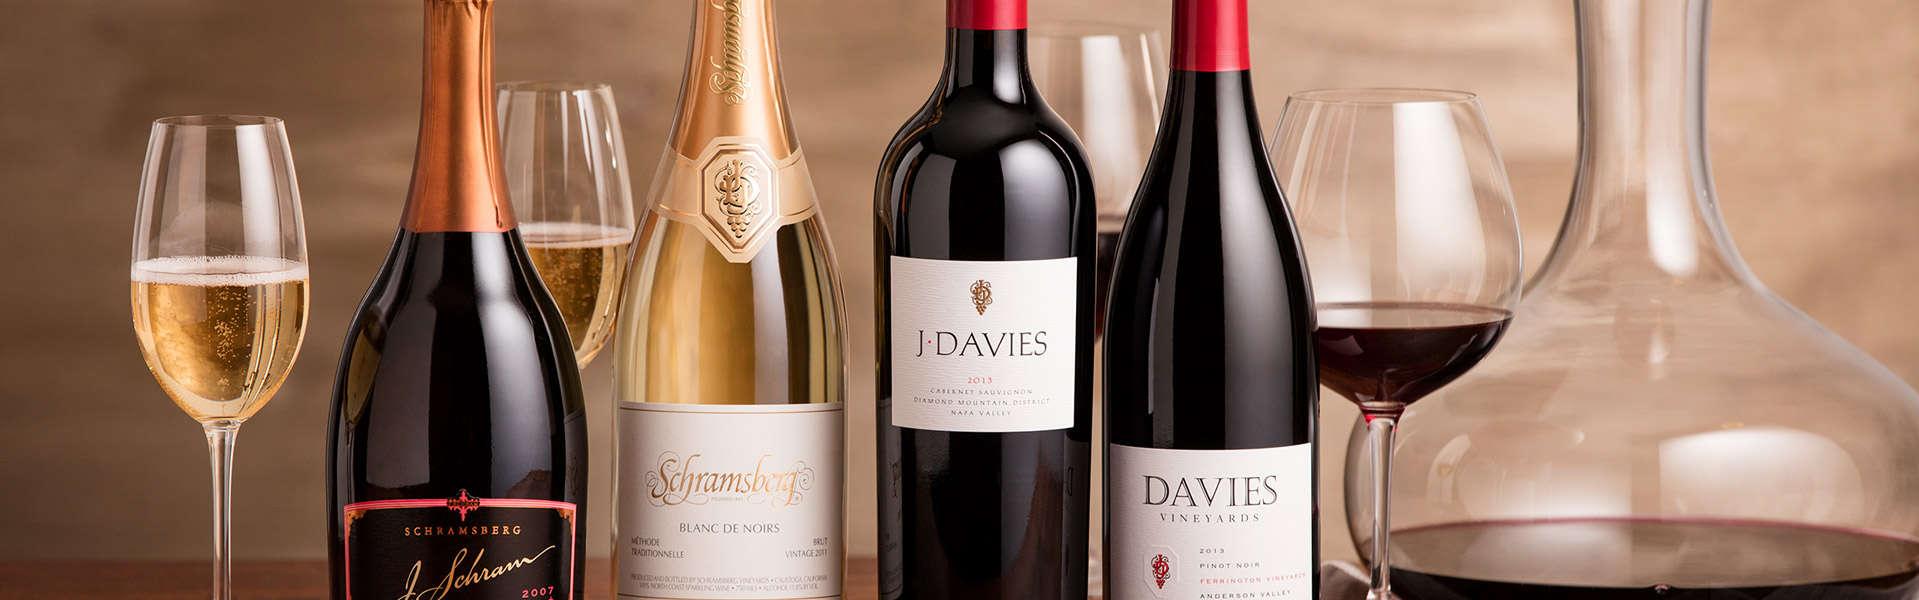 Display of J. Schram Rosé, Blanc de Noirs, J. Davies Estate Cabernet Sauvignon and Davies Vineyards Pinot Noir with glasses and wine carafe